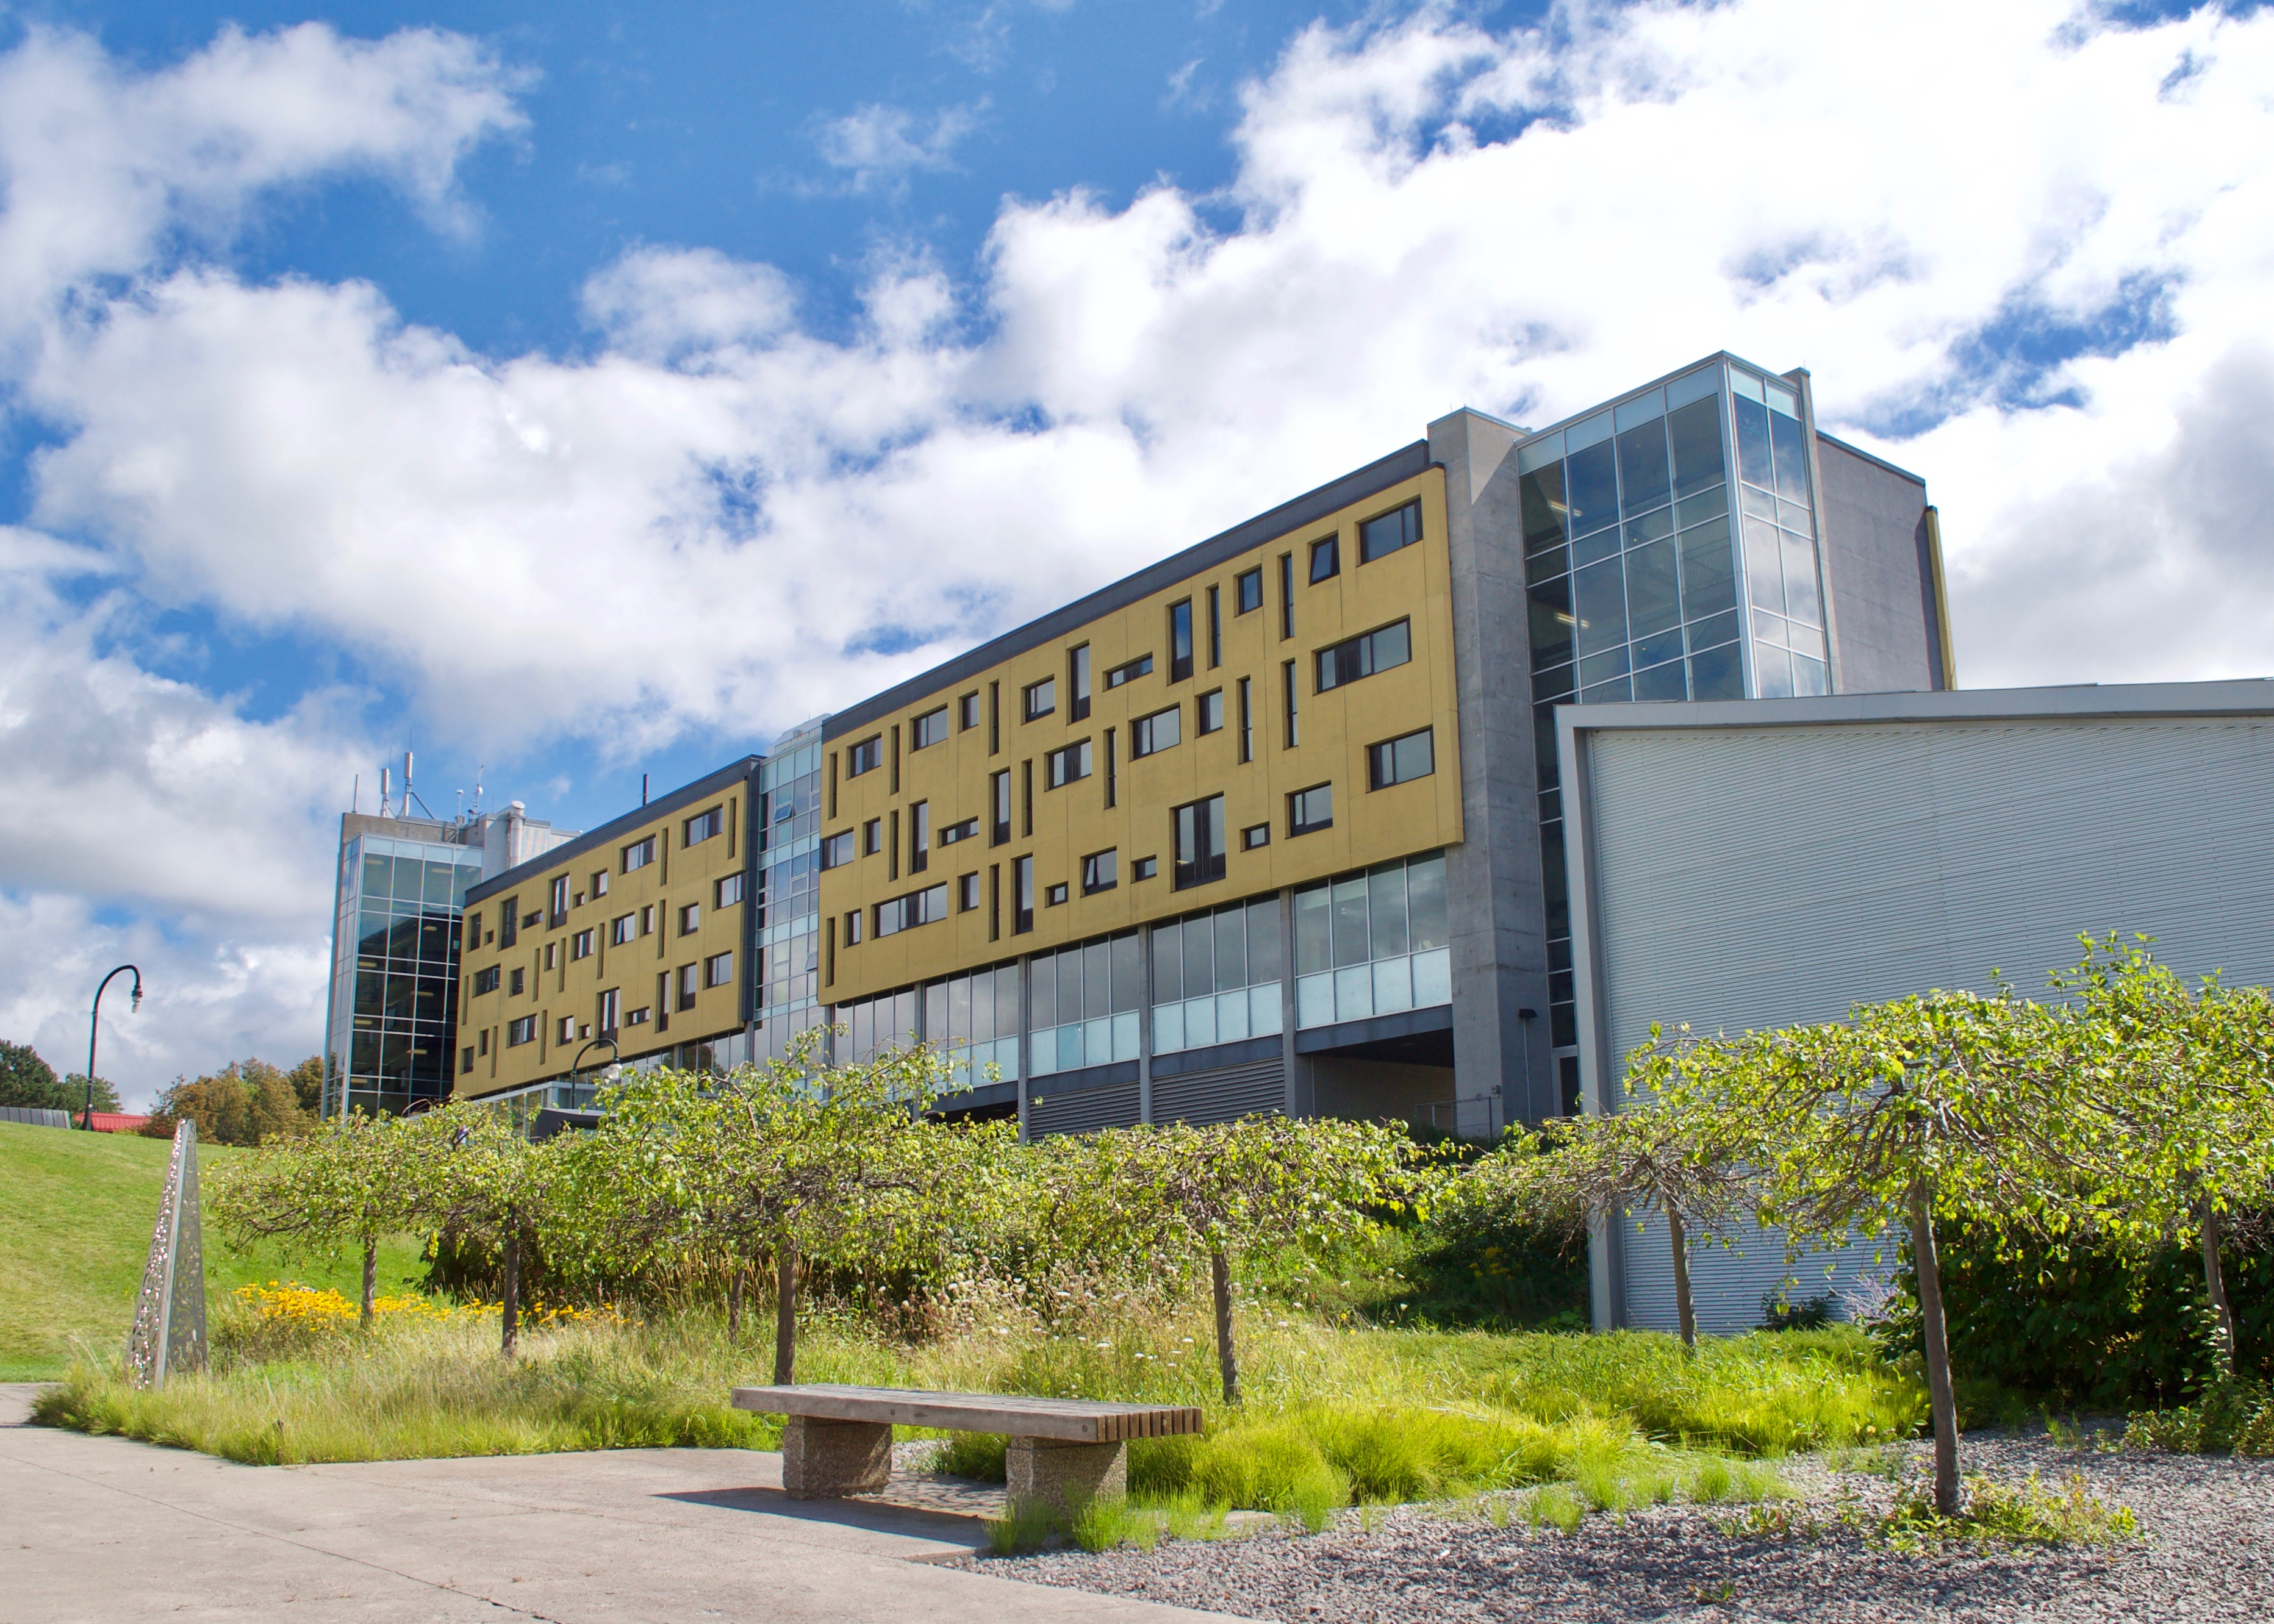 Peter Gzowski College: Future Forward